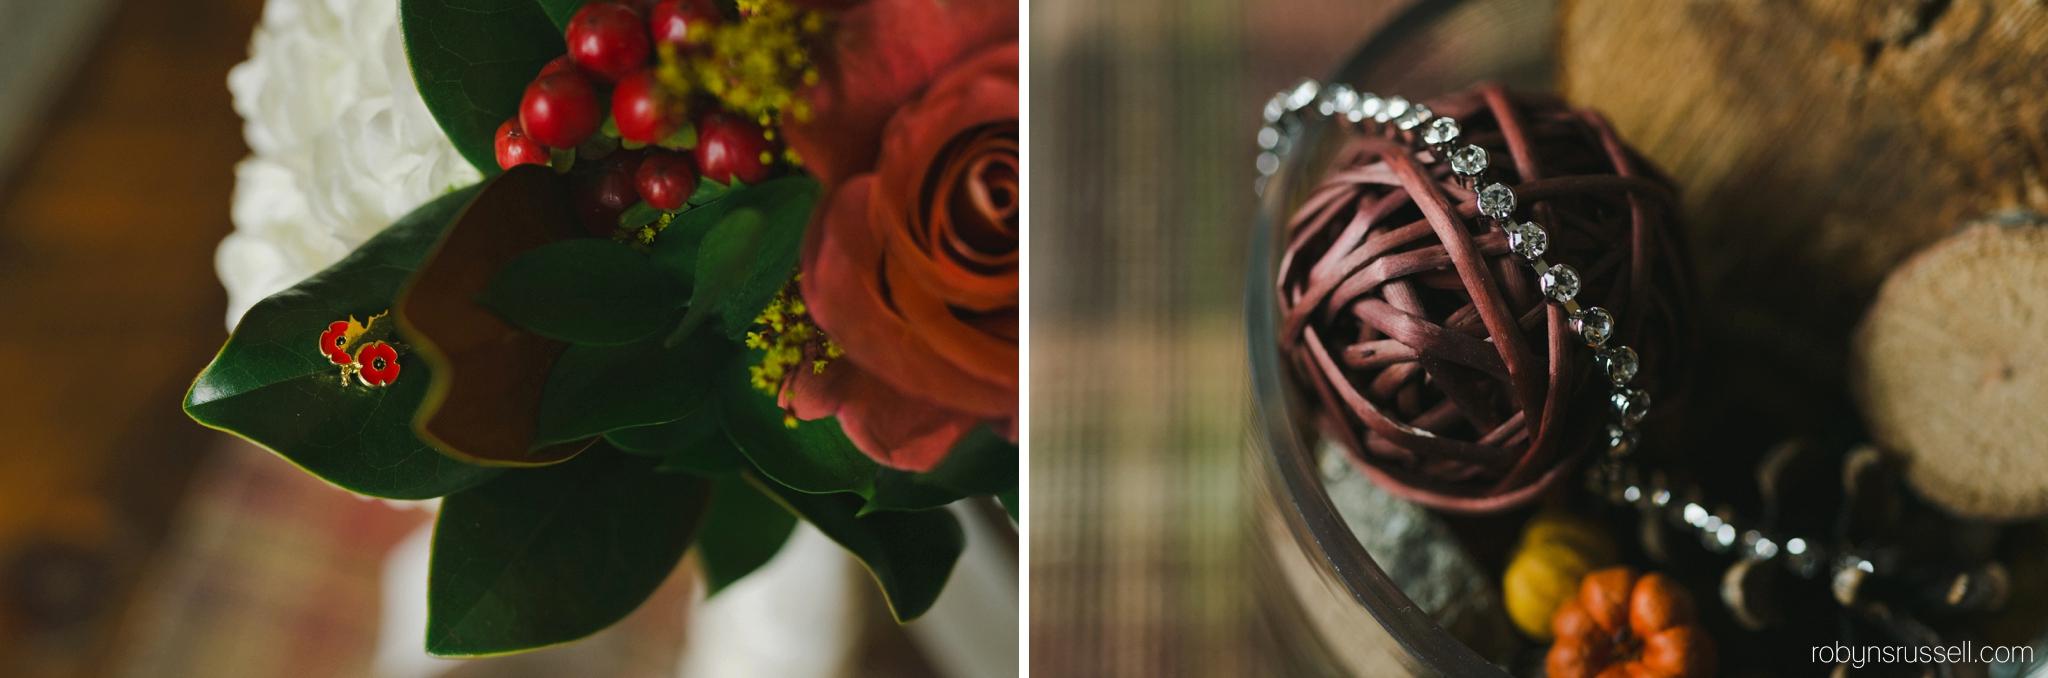 6-bridal-details-mississauga-canadian-wedding.jpg